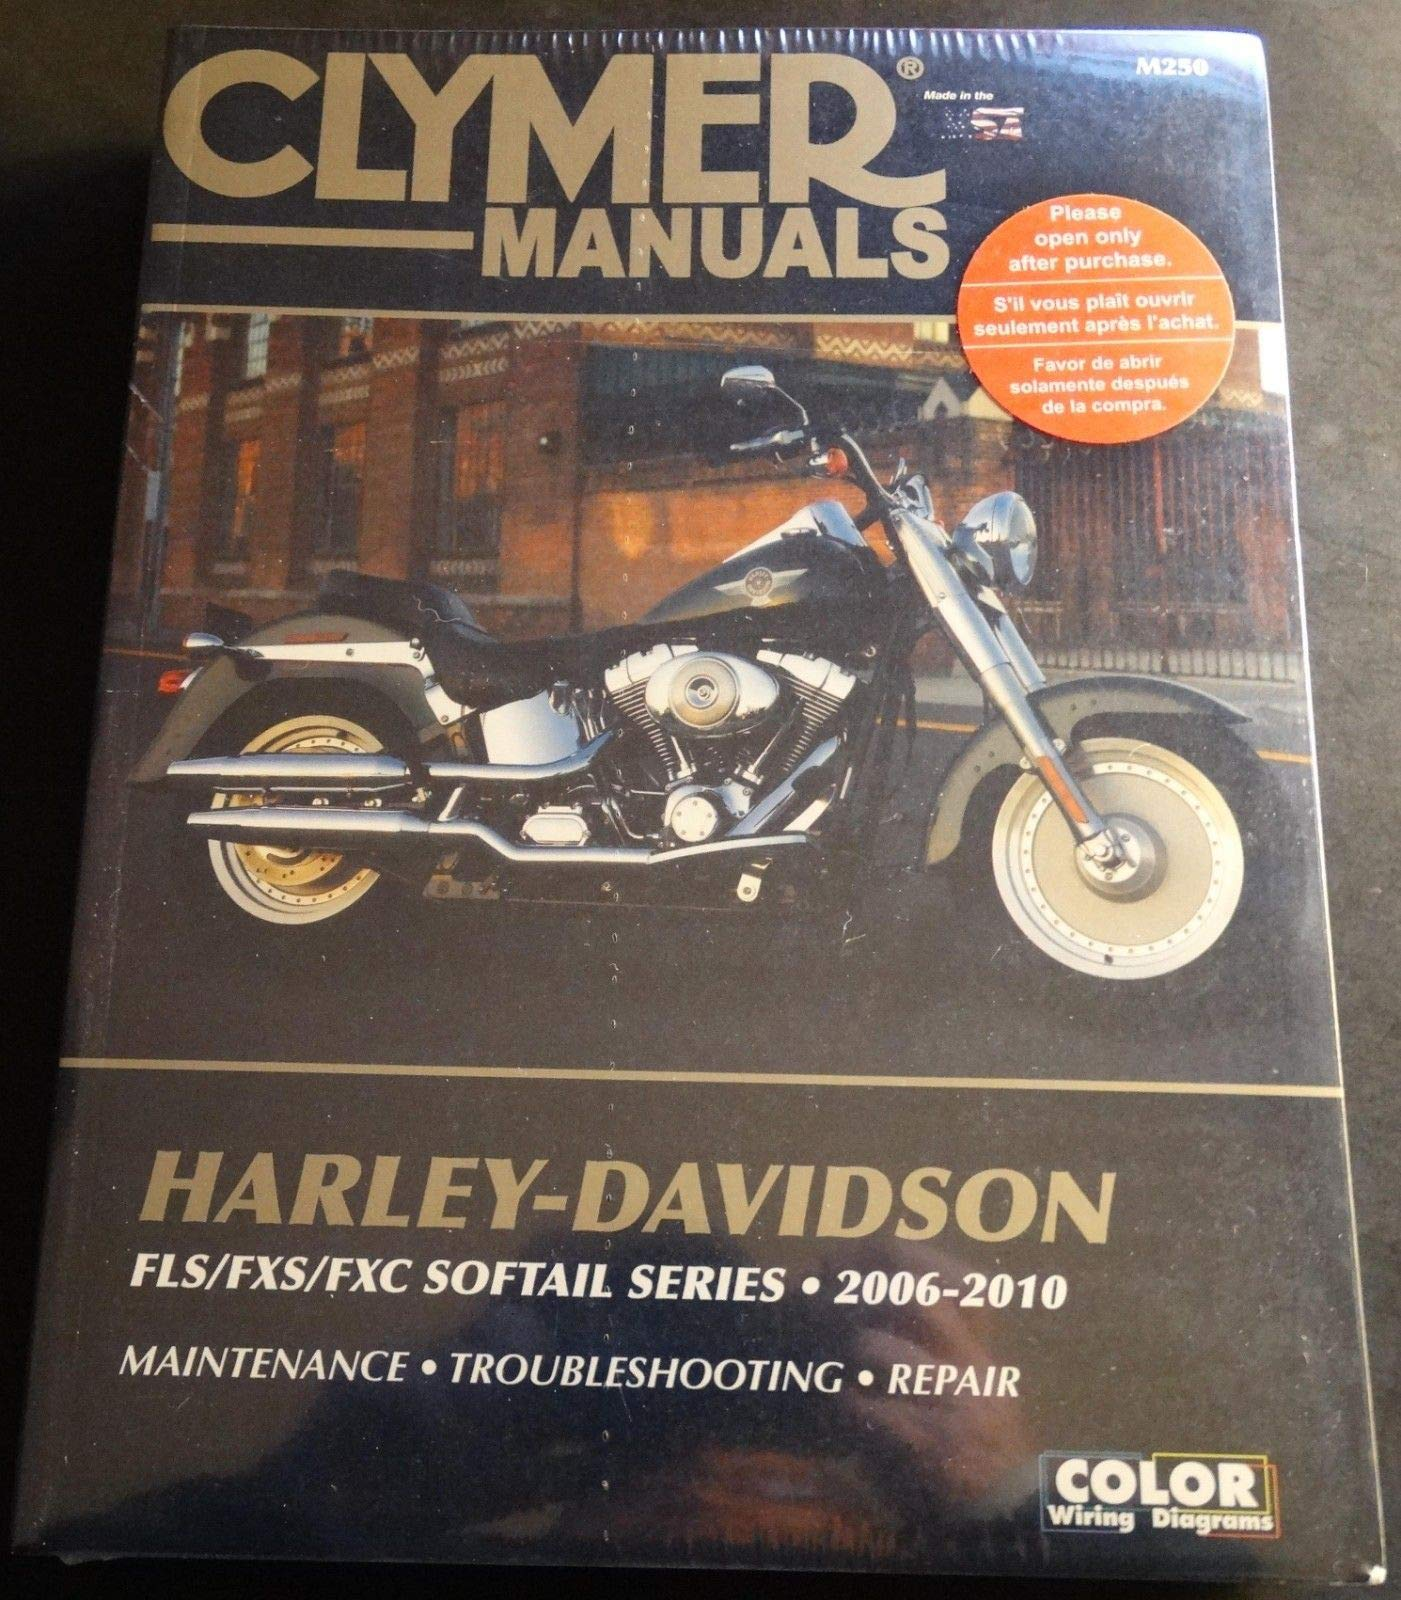 Harley-Davidson FLS//FXS//FXC Sofftail Series 2006-2010